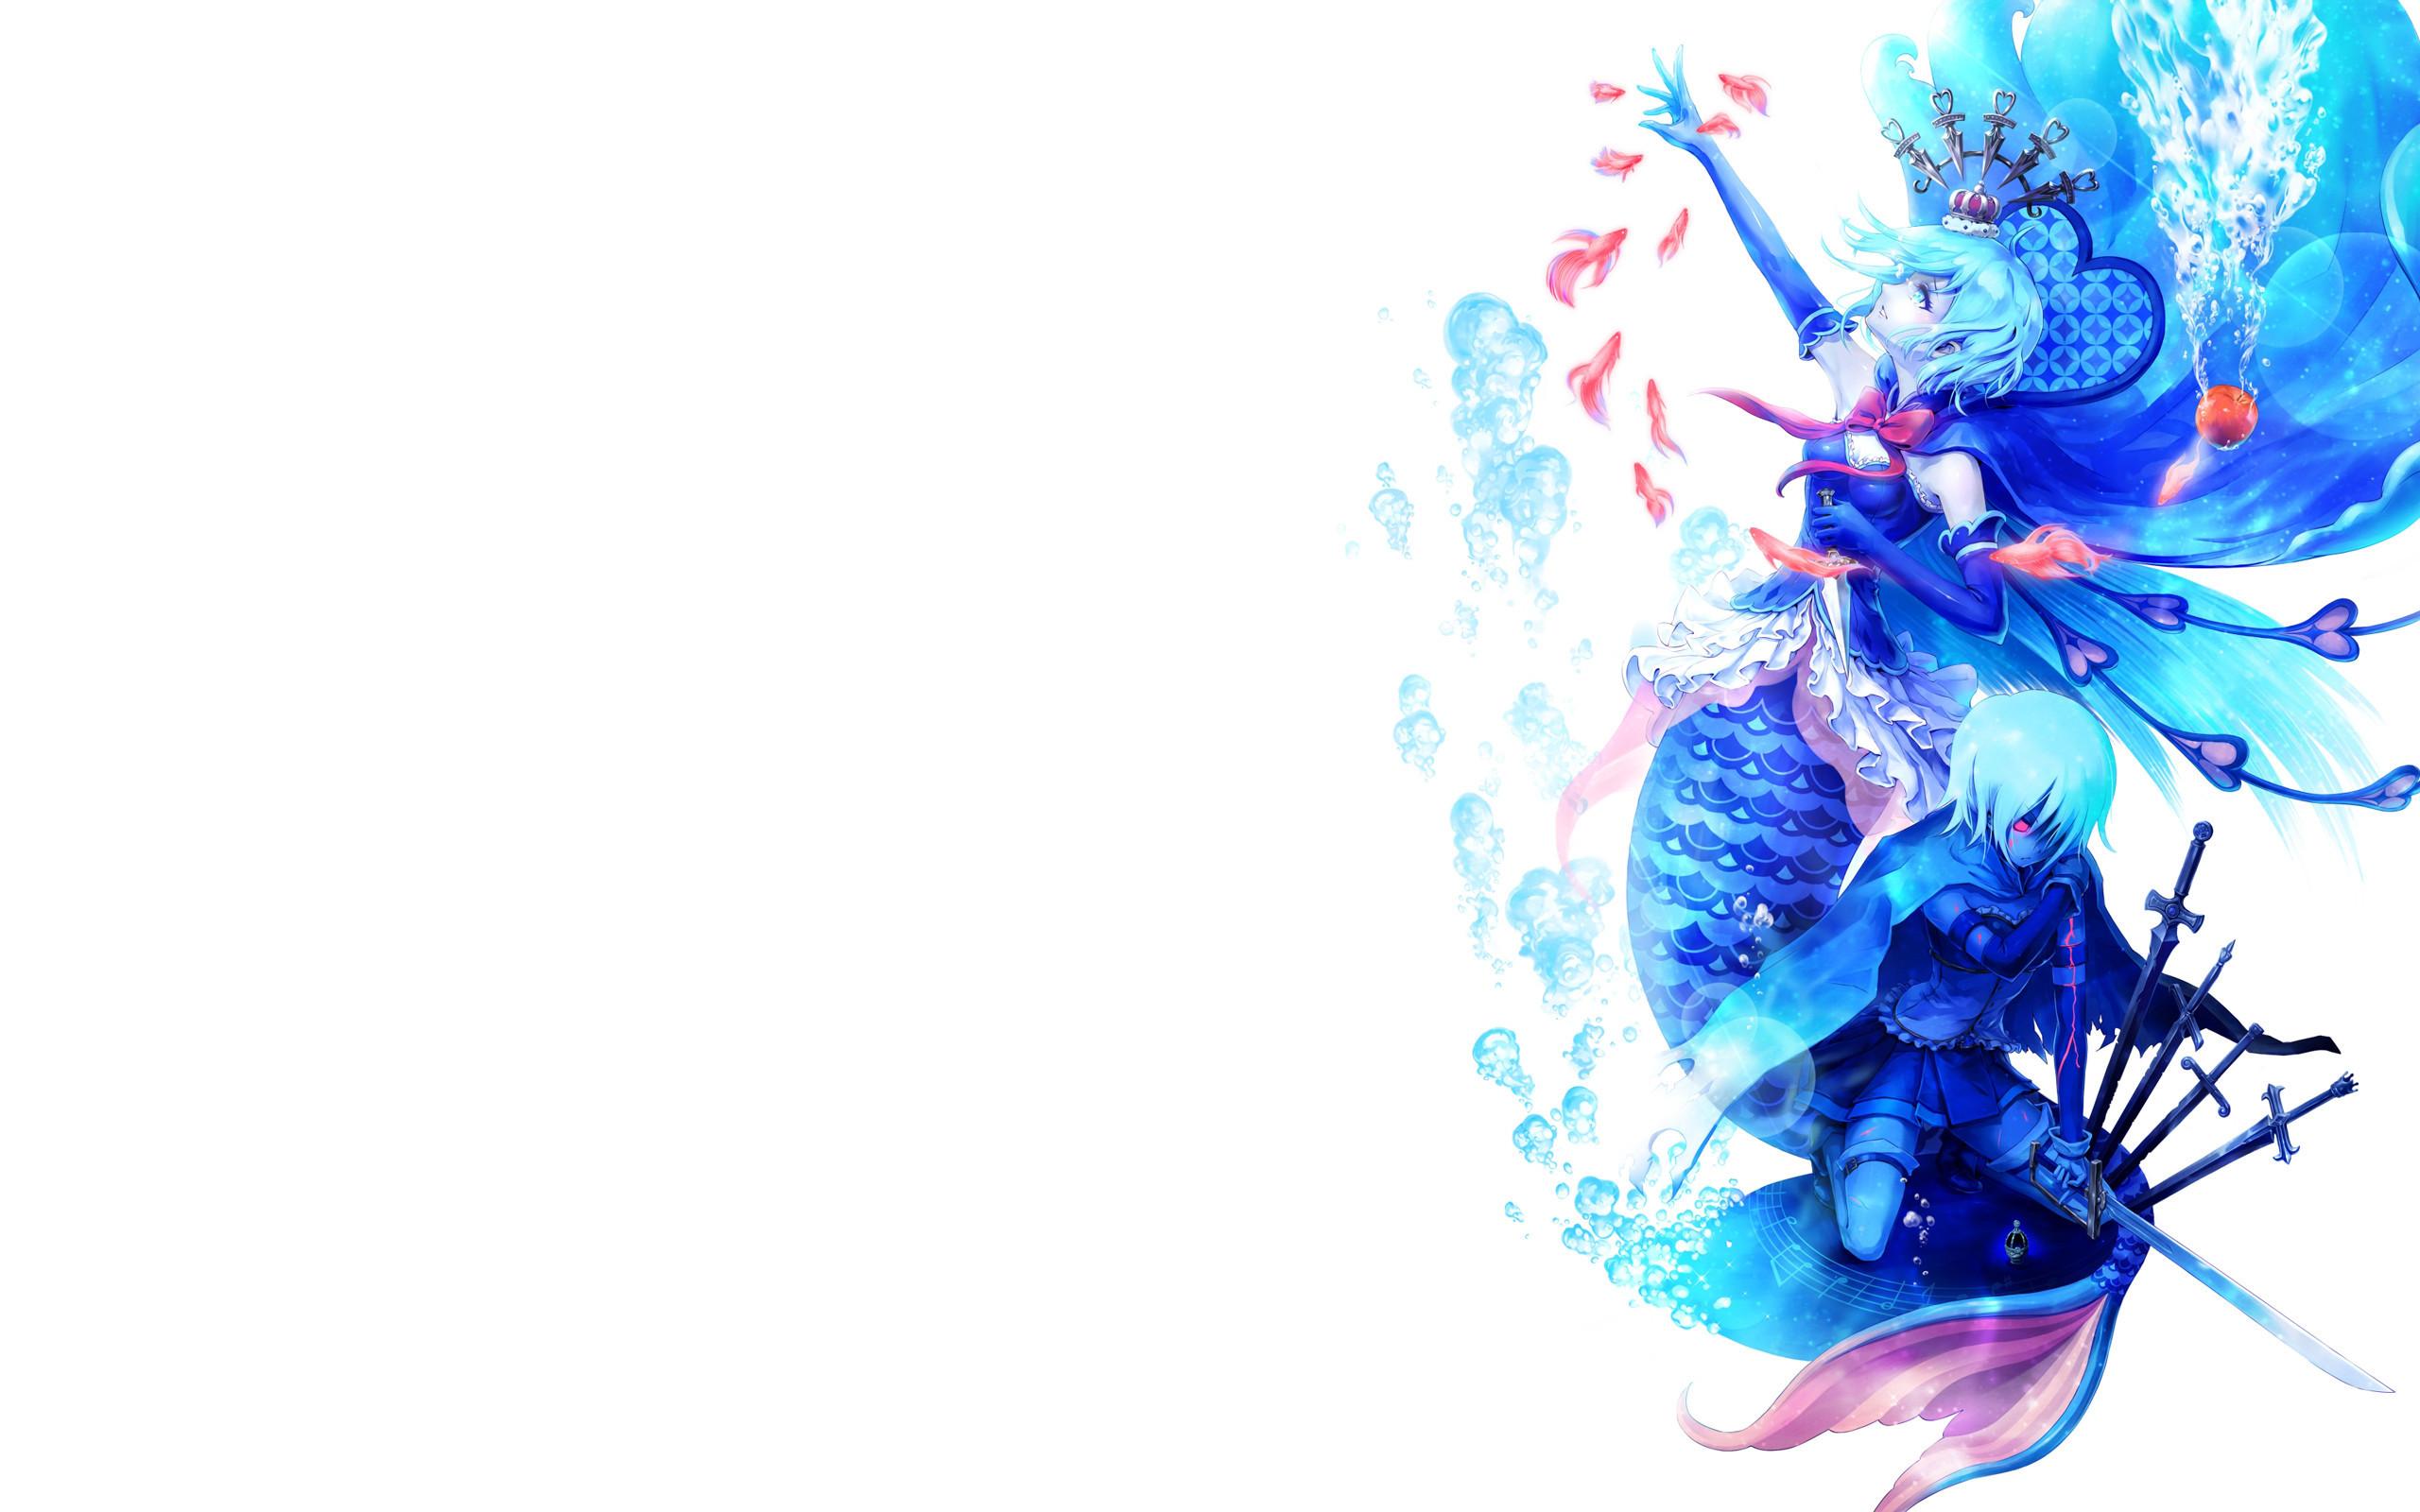 2952x2031 Anime Girls Mahou Shoujo Madoka Magica Miki Sayaka Sakura Kyouko Free IPhone Or Android Full HD Wallpaper